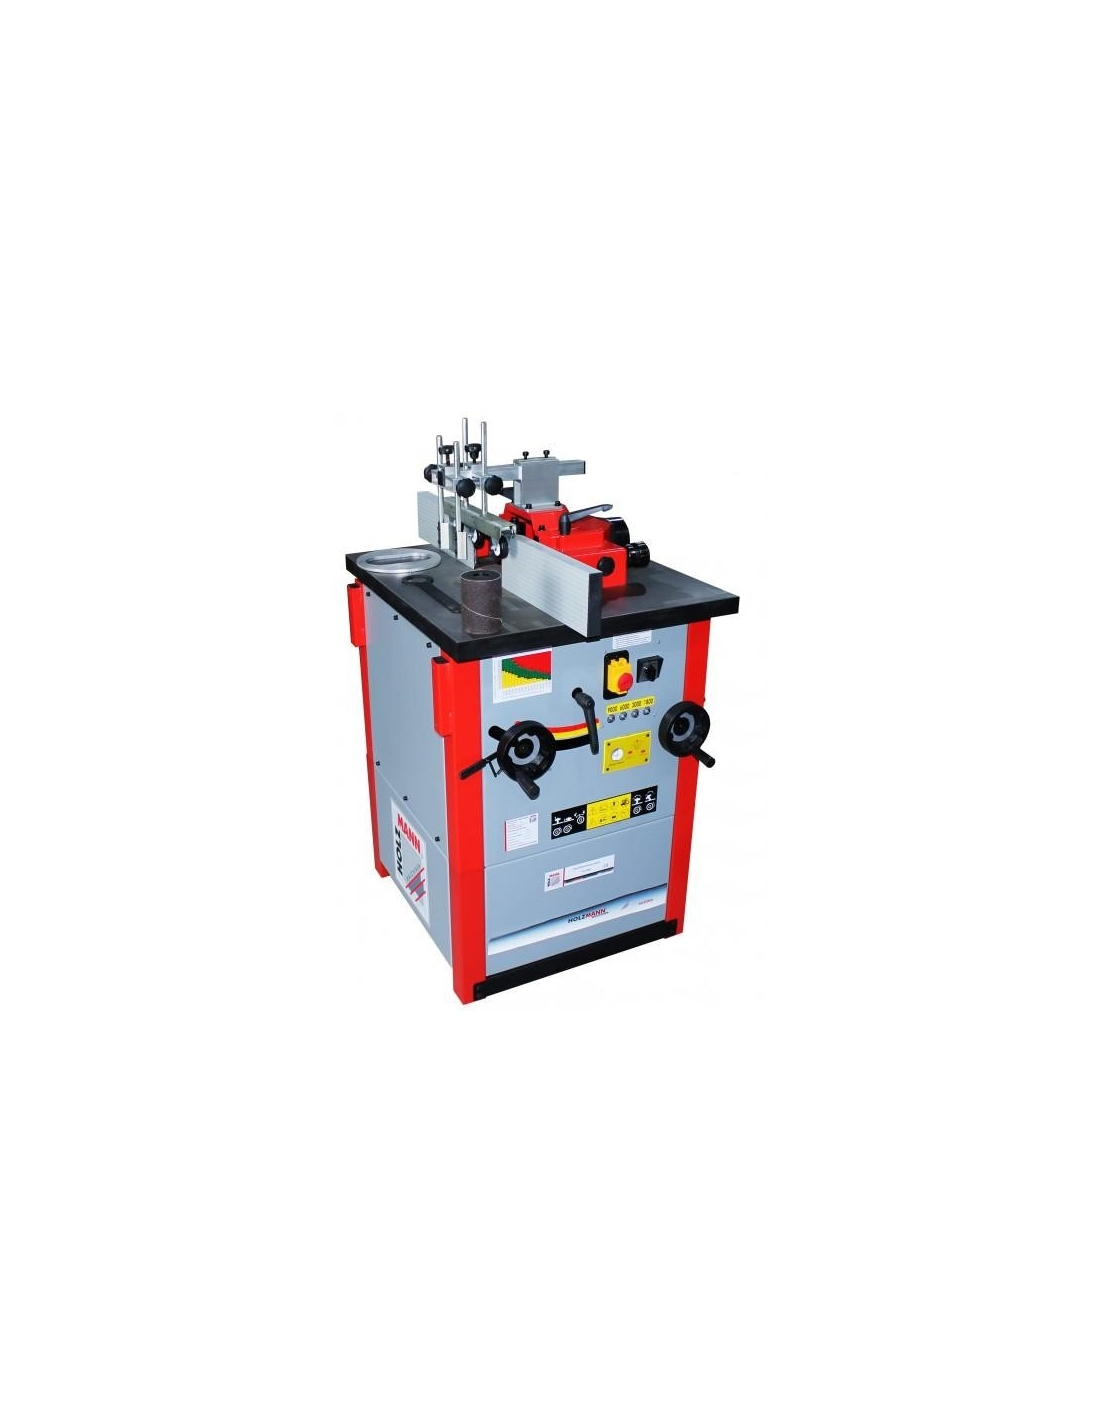 Masina pentru frezat cu ax inclinabil Holzmann FS 200S - 230 V